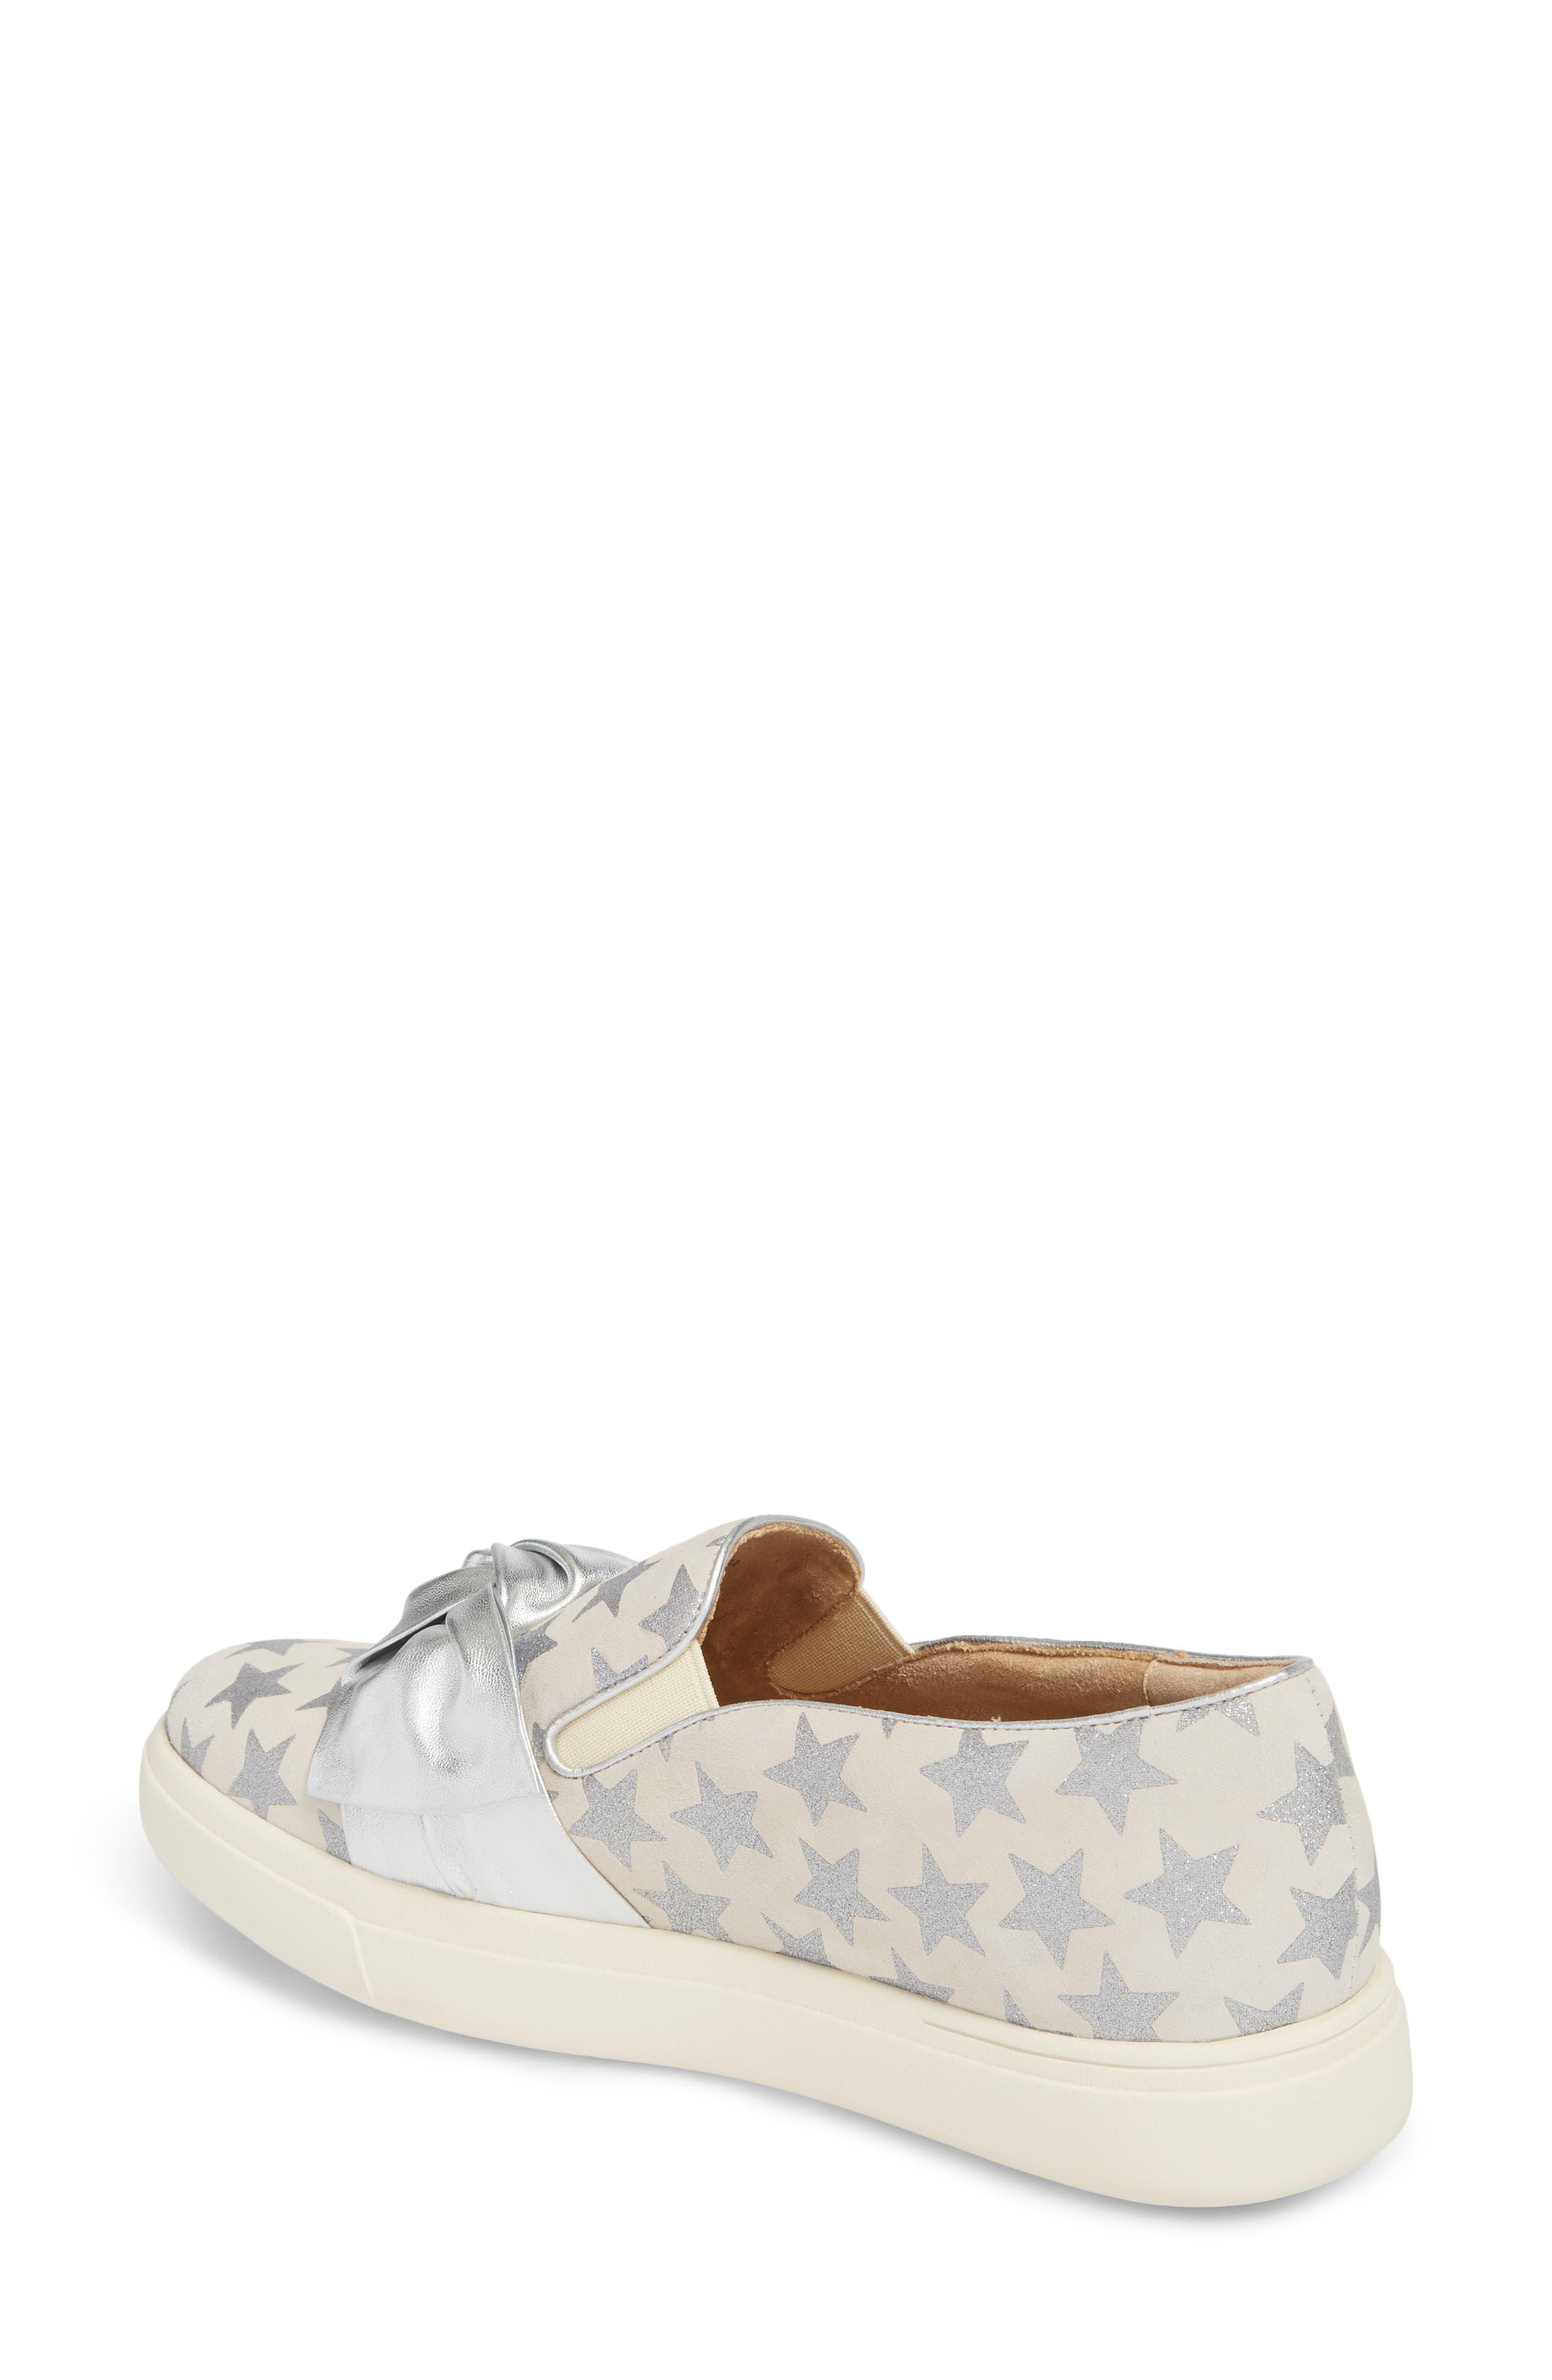 Odelet Slip-On Sneaker,                             Alternate thumbnail 2, color,                             Beige/ Silver Suede